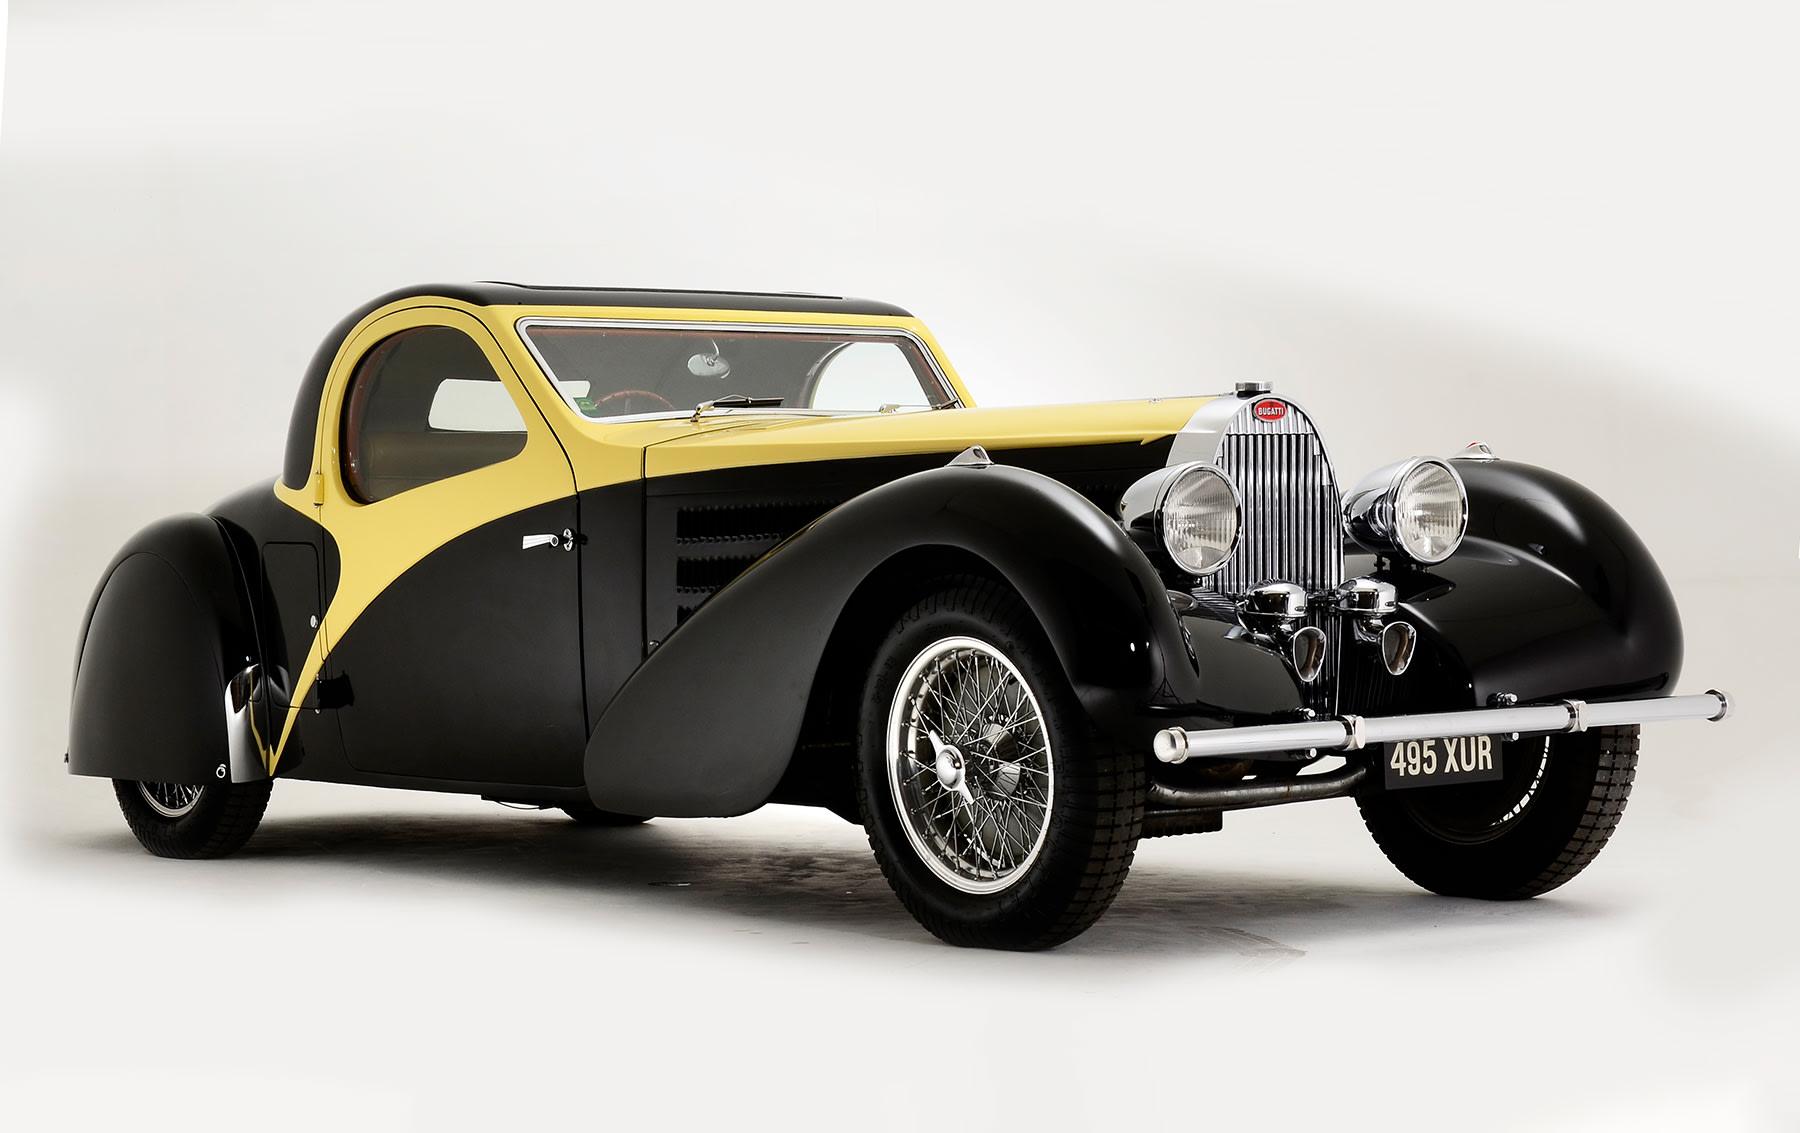 1936 Bugatti Type 57 Atalante (1)